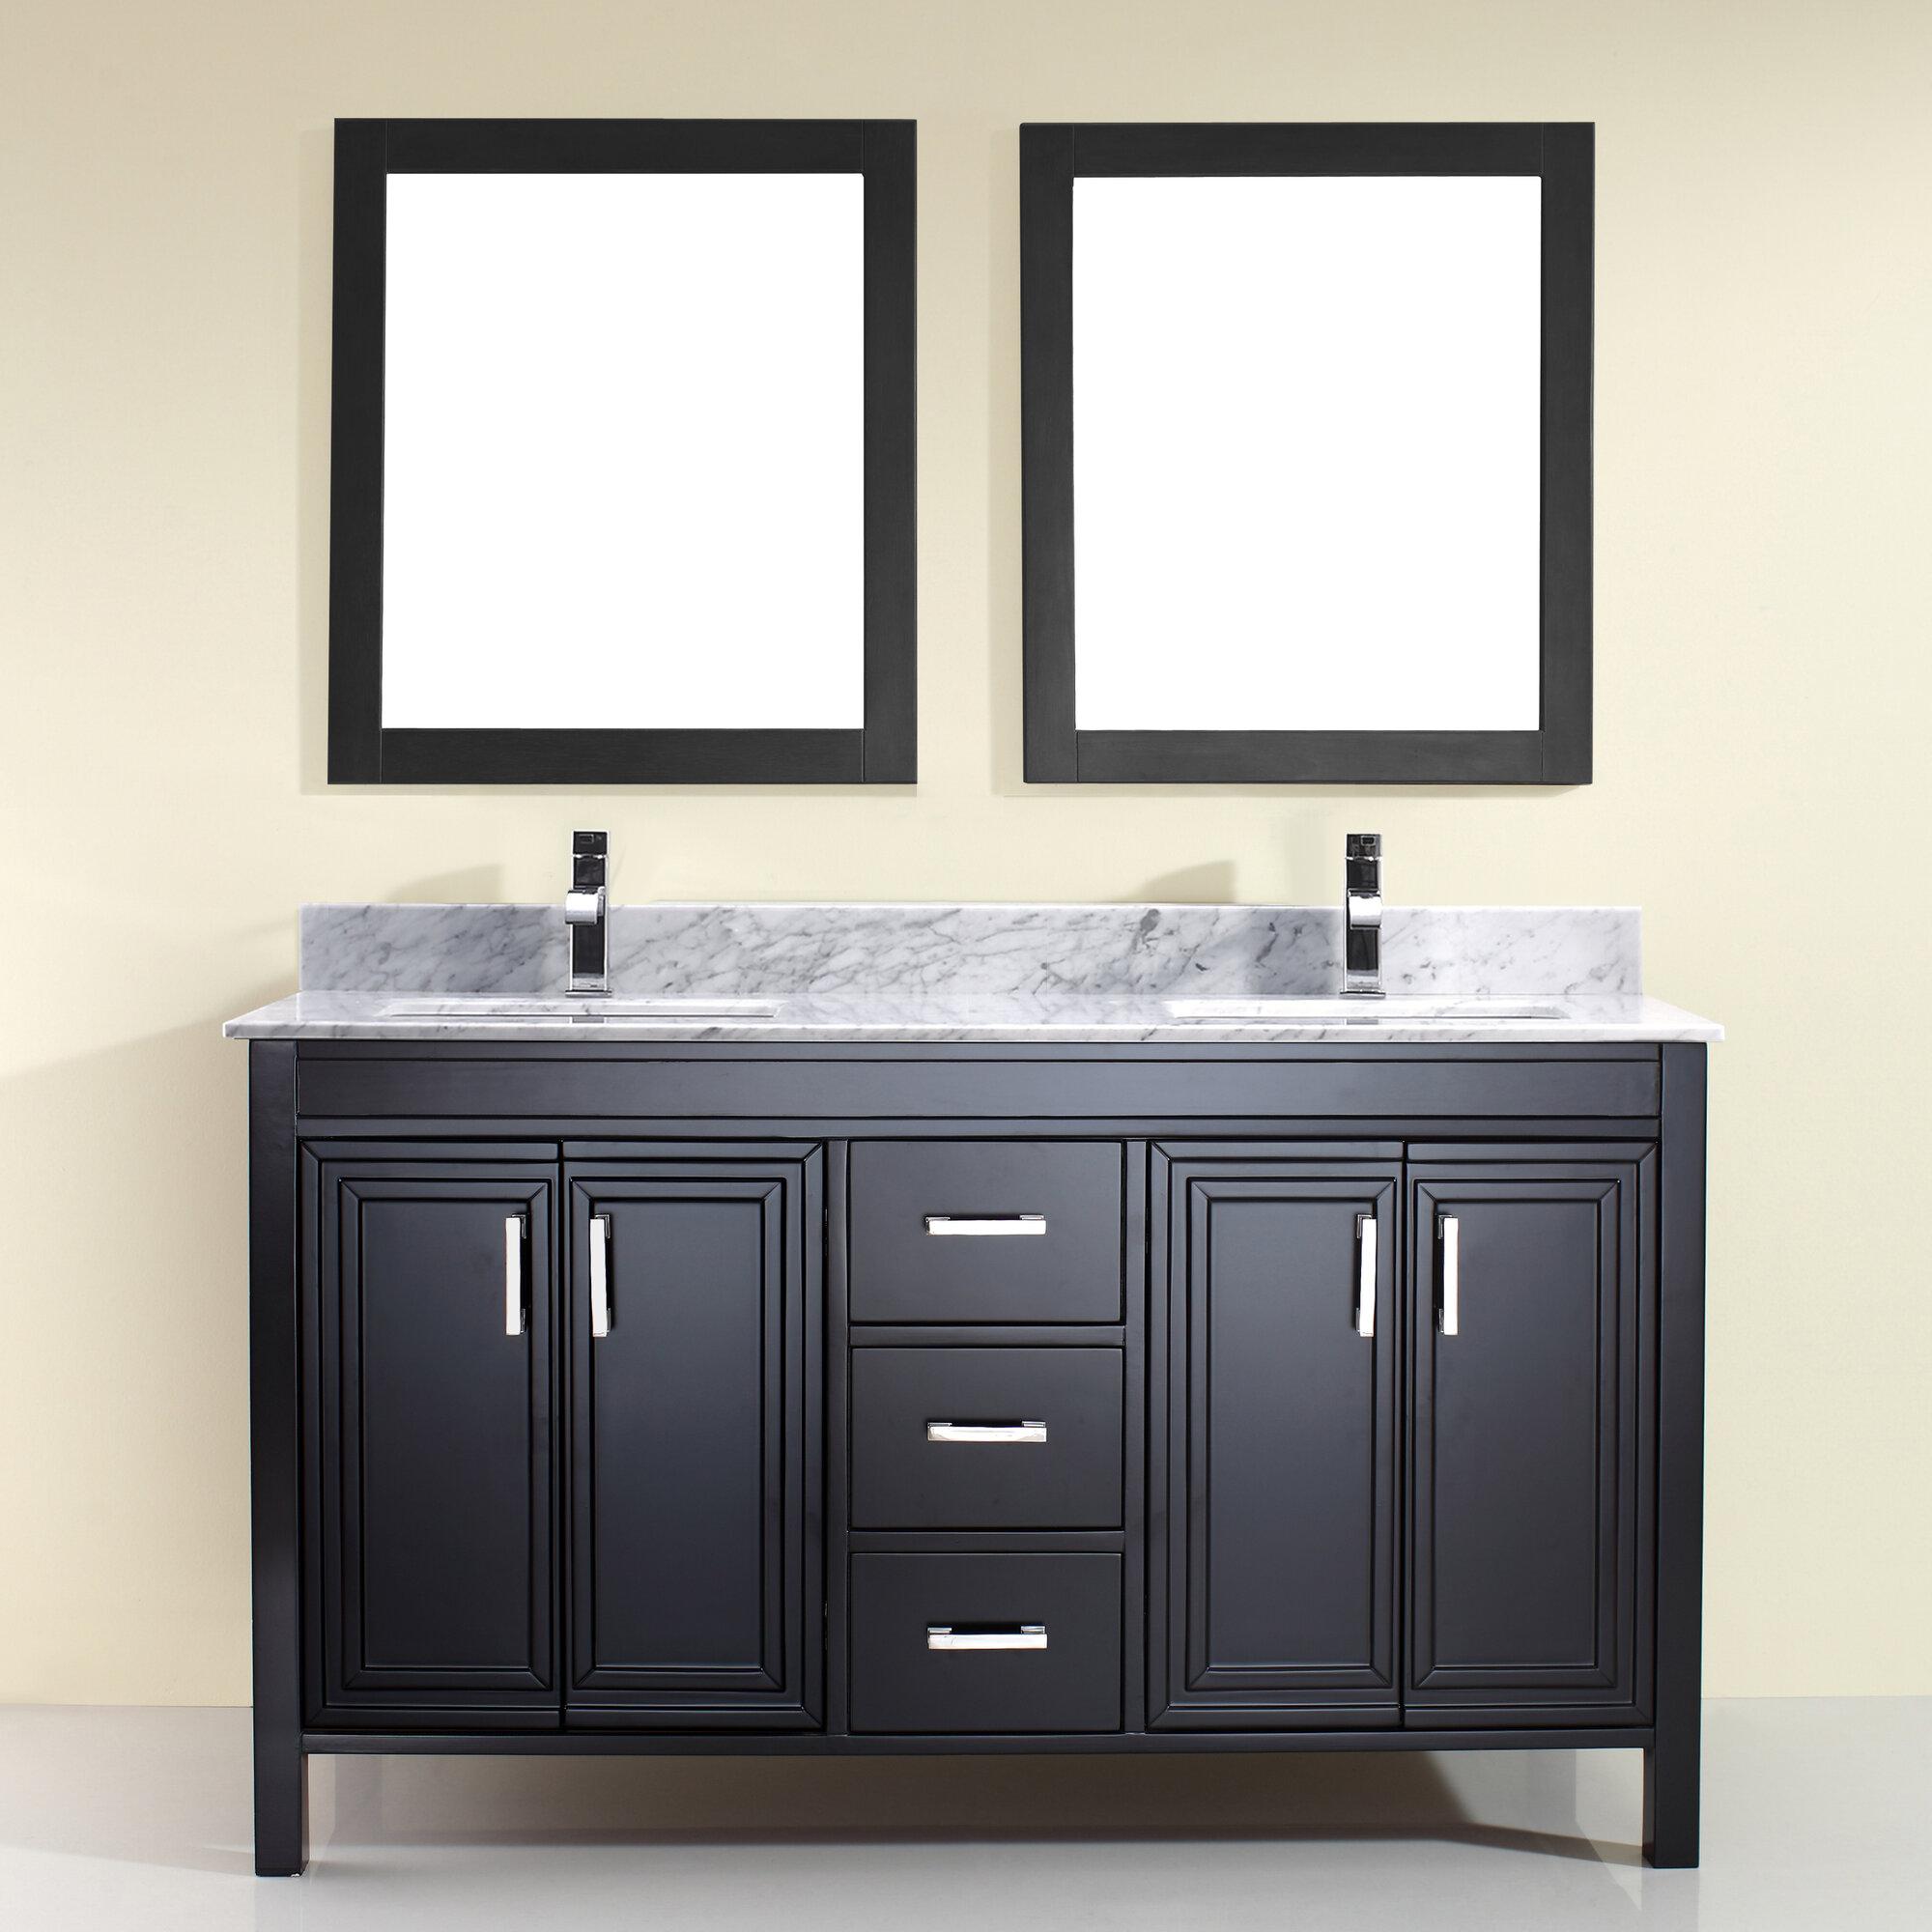 "Ebay Used Bathroom Vanity: Bauhaus Bath Coraline 60"" Double Bathroom Vanity Set With"